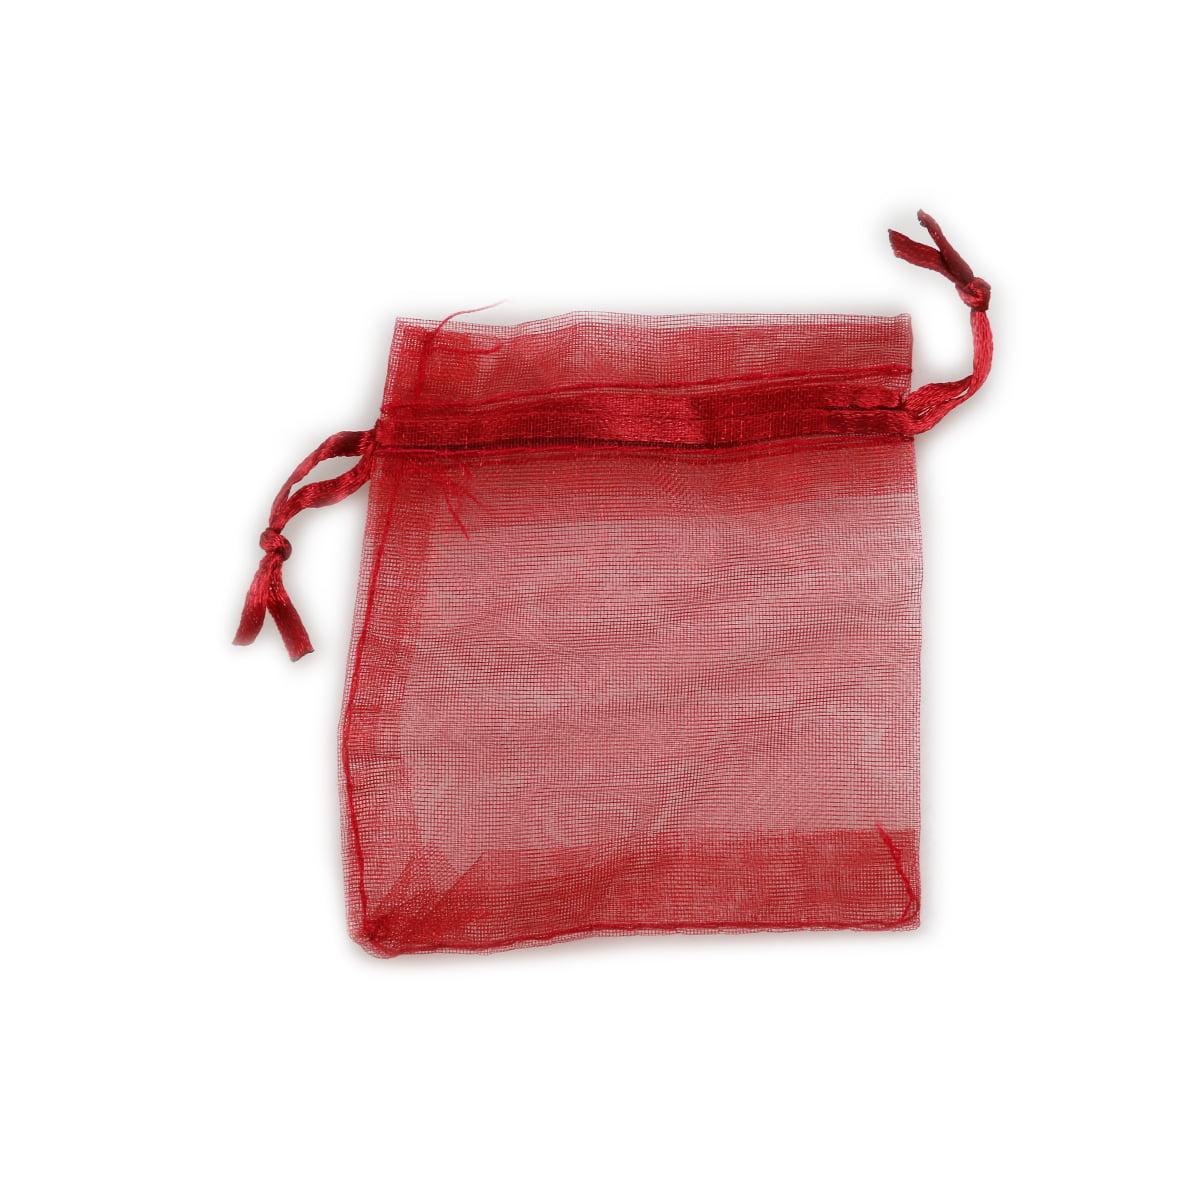 100pcs 7*9cm Organza Drawstring Gift Bags Wedding Favor Bags ...